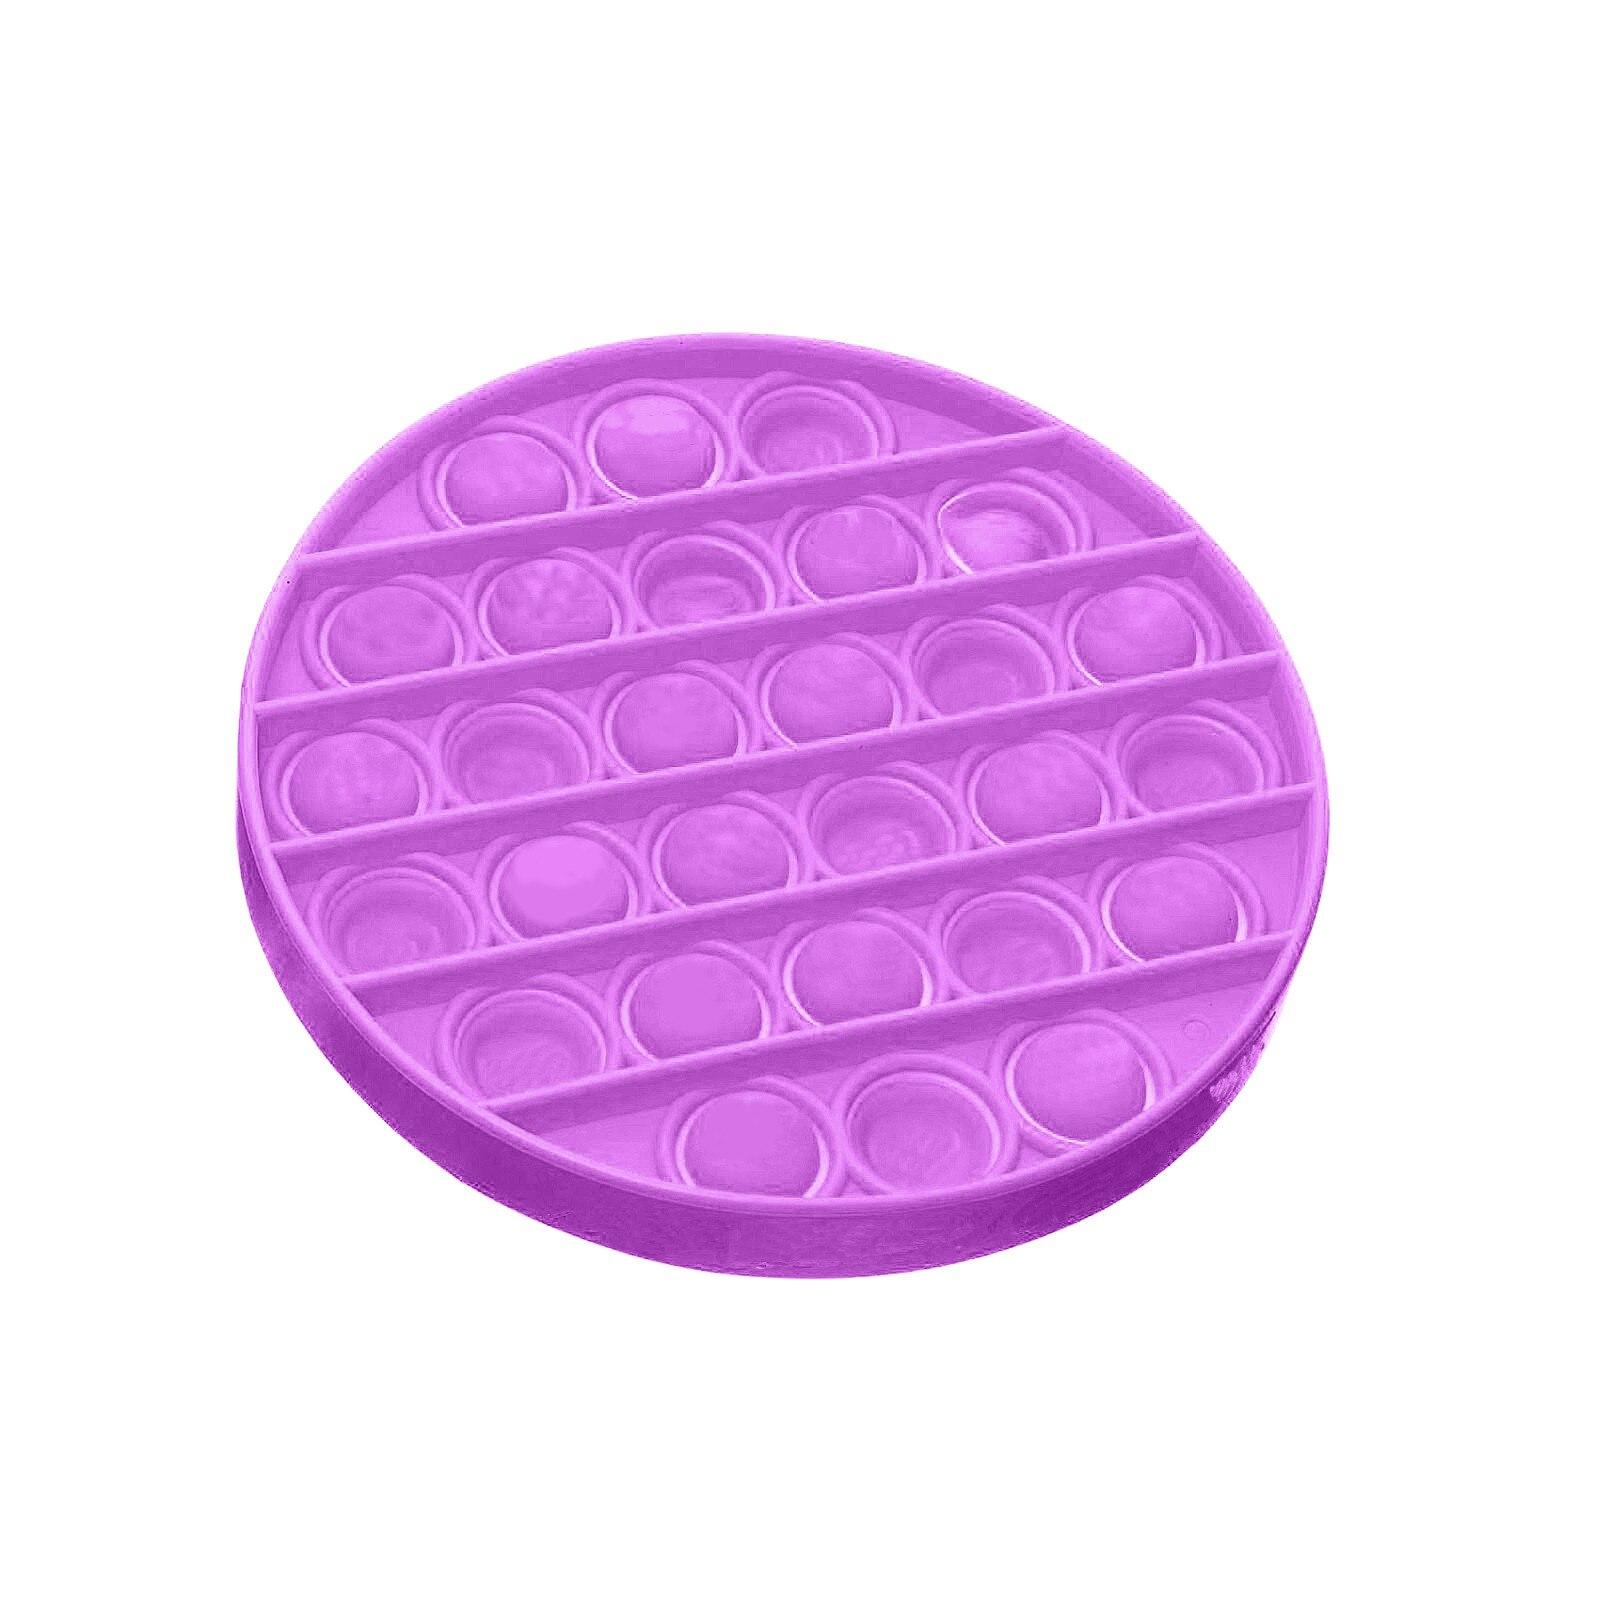 Toys Adult It-Fidget-Toys Stress Reliever Push-Pops Bubble-Sensory-Toy Needs Anti-Stress img3